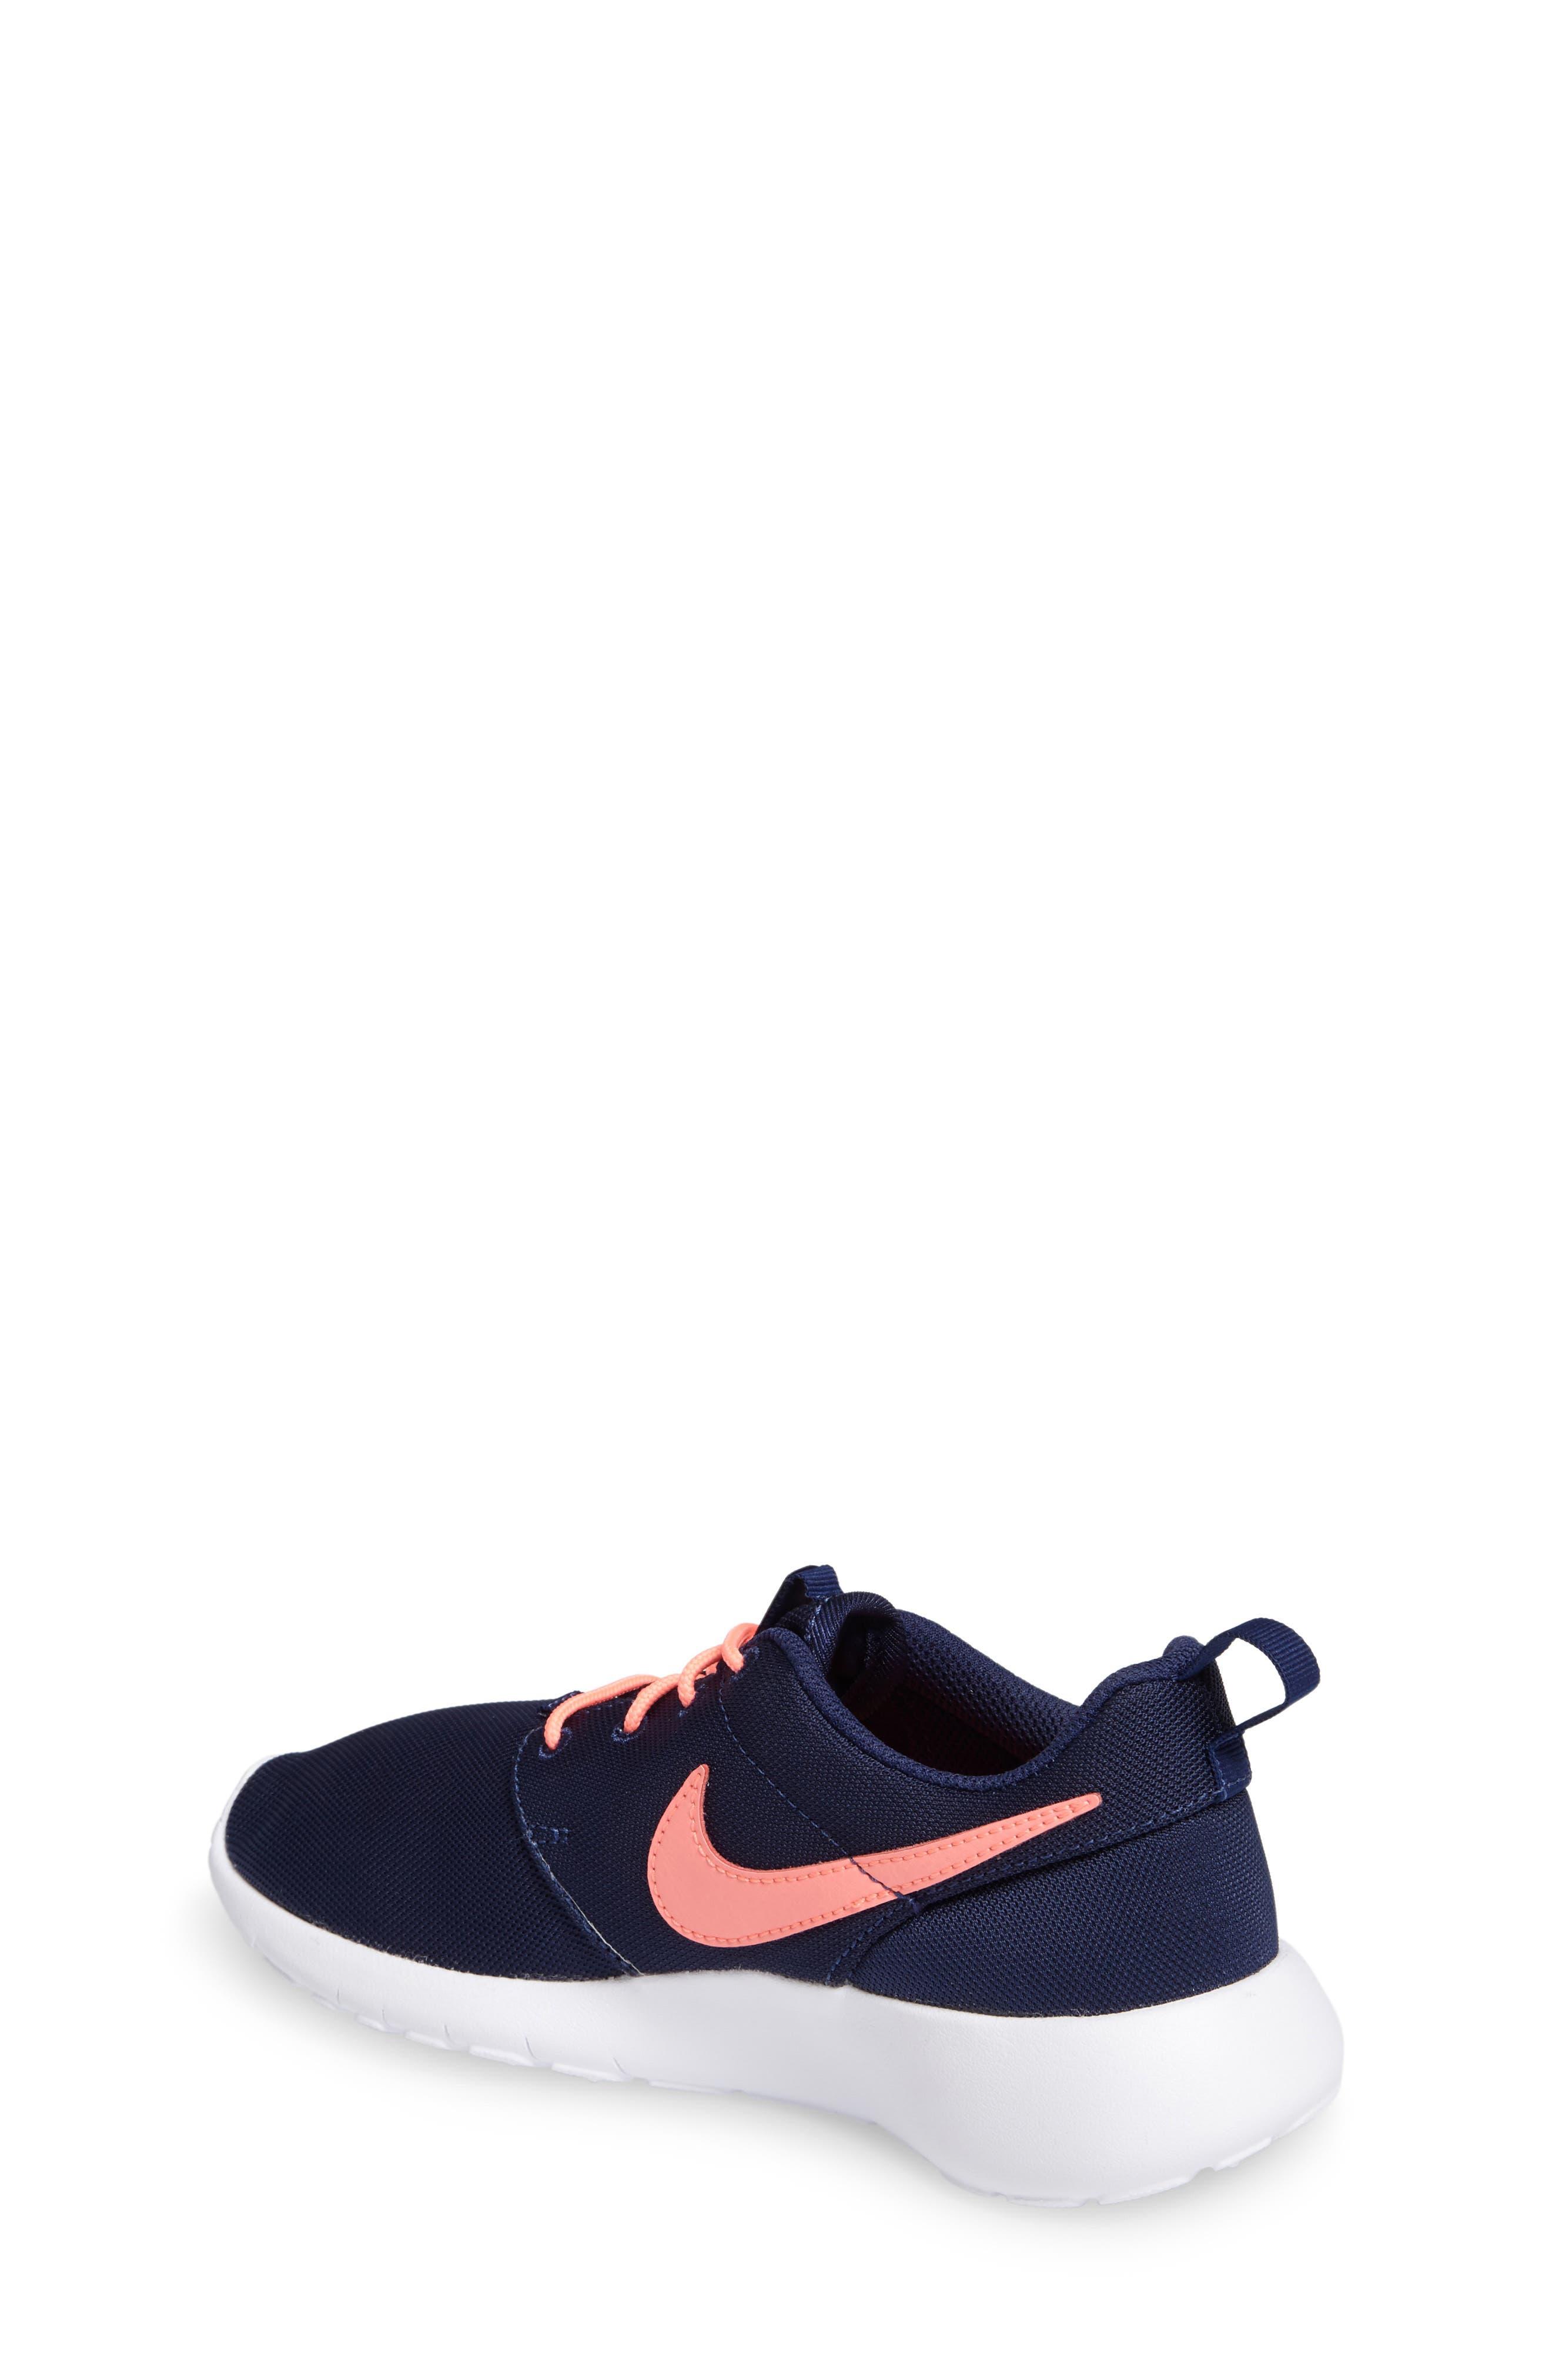 Alternate Image 2  - Nike 'Roshe Run' Athletic Shoe (Little Kid & Big Kid)